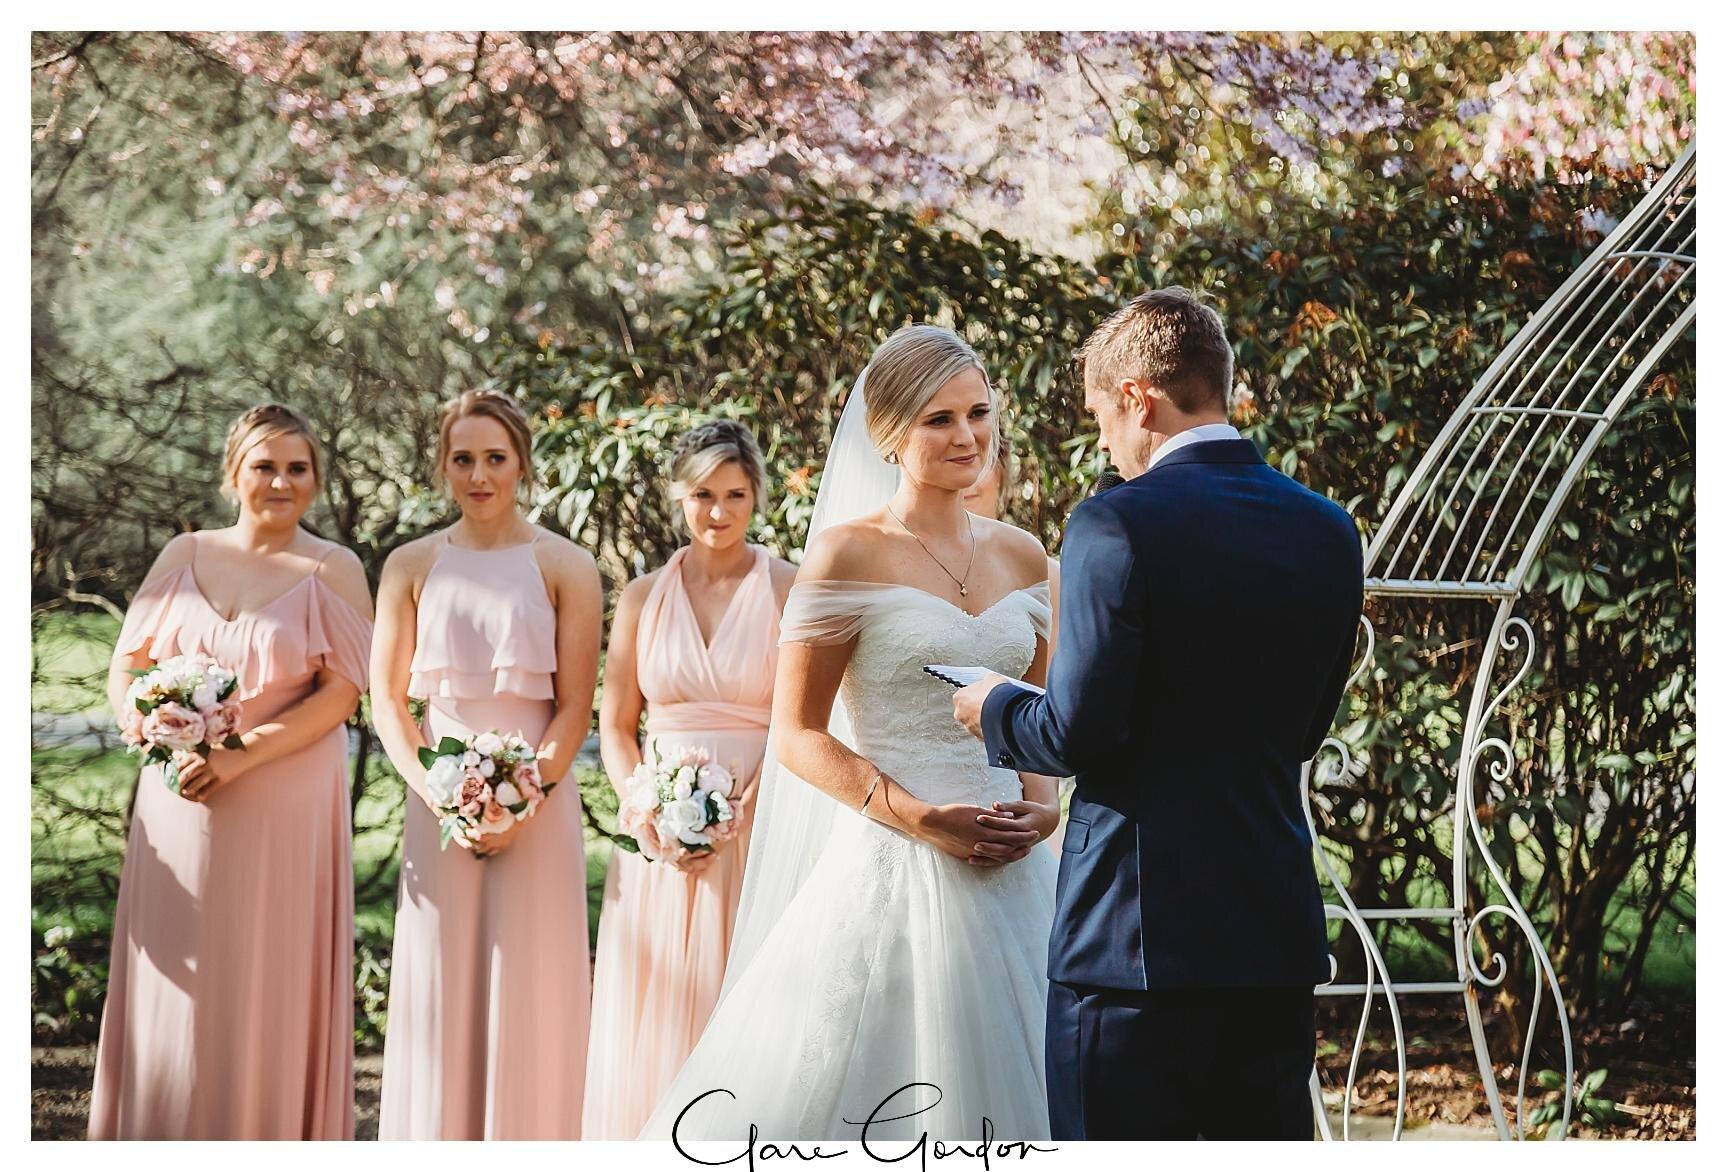 Henley-Hotel-Cherry-blossom-wedding-photos (49).jpg